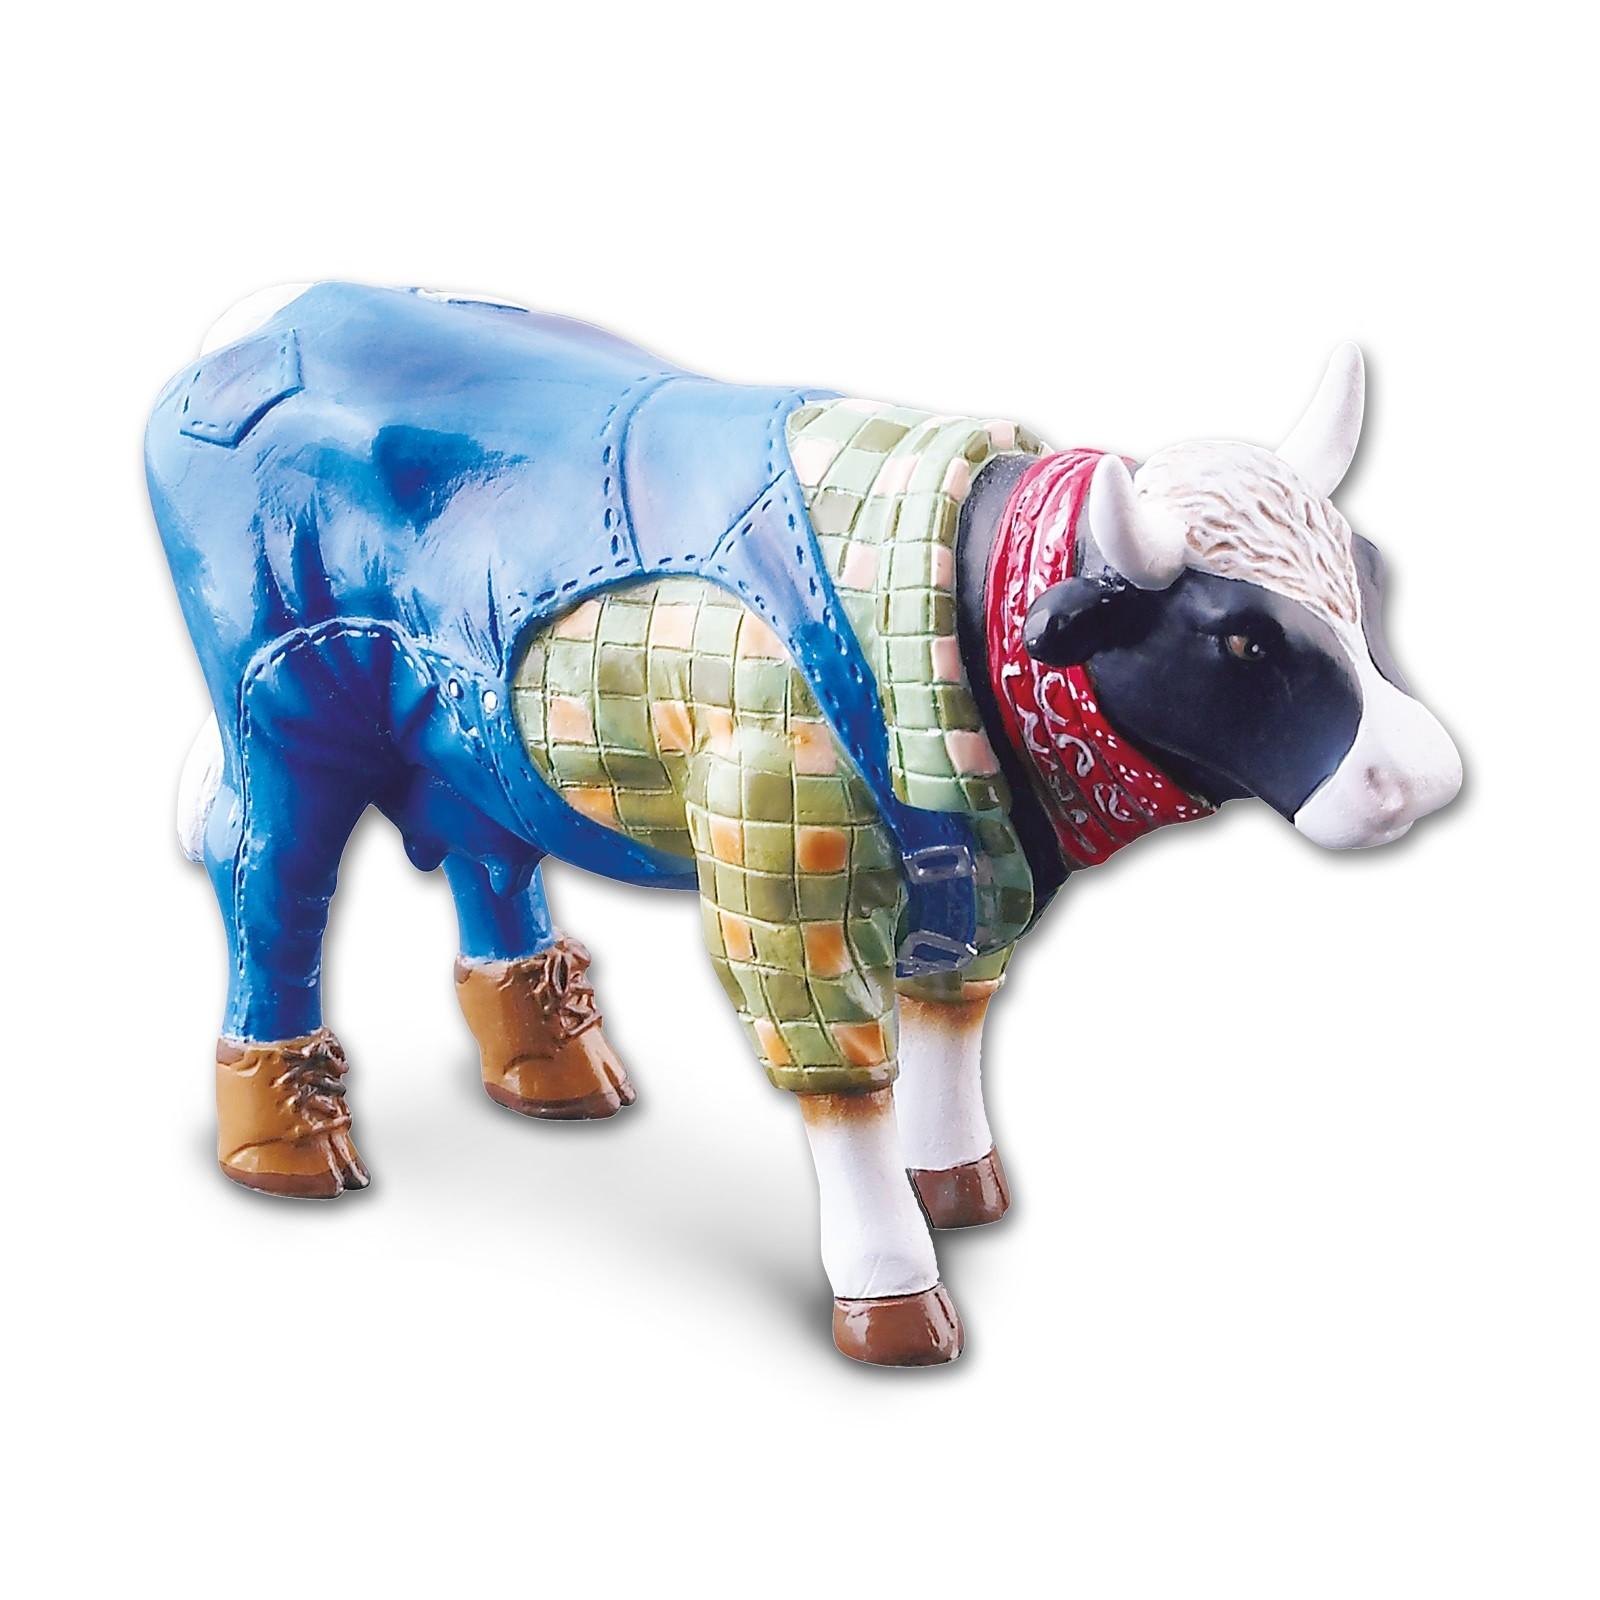 Design Kuh als Bauer mit Latzhose 4,5cm Köthen Kuhparade KOS005